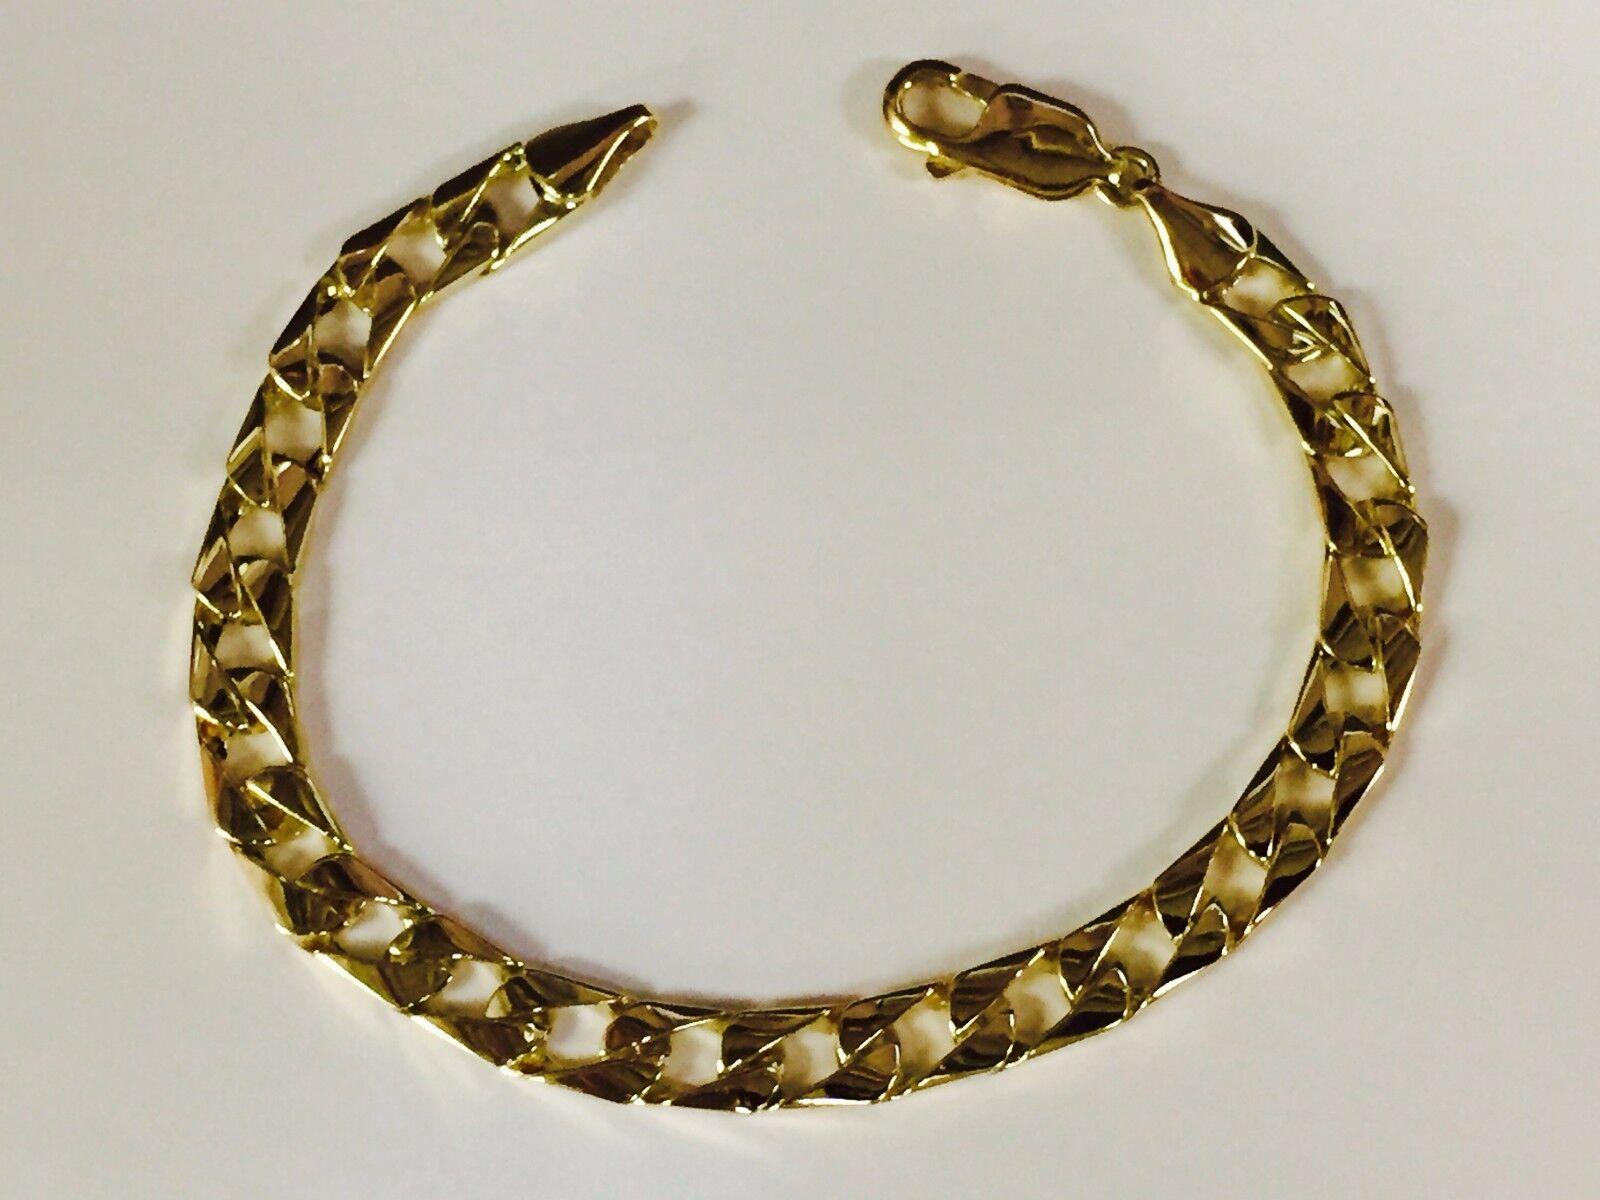 1.08 Carats 0.9 Grams Of 925 Sterling Silver Cognac Zircon Round Stud Earrings